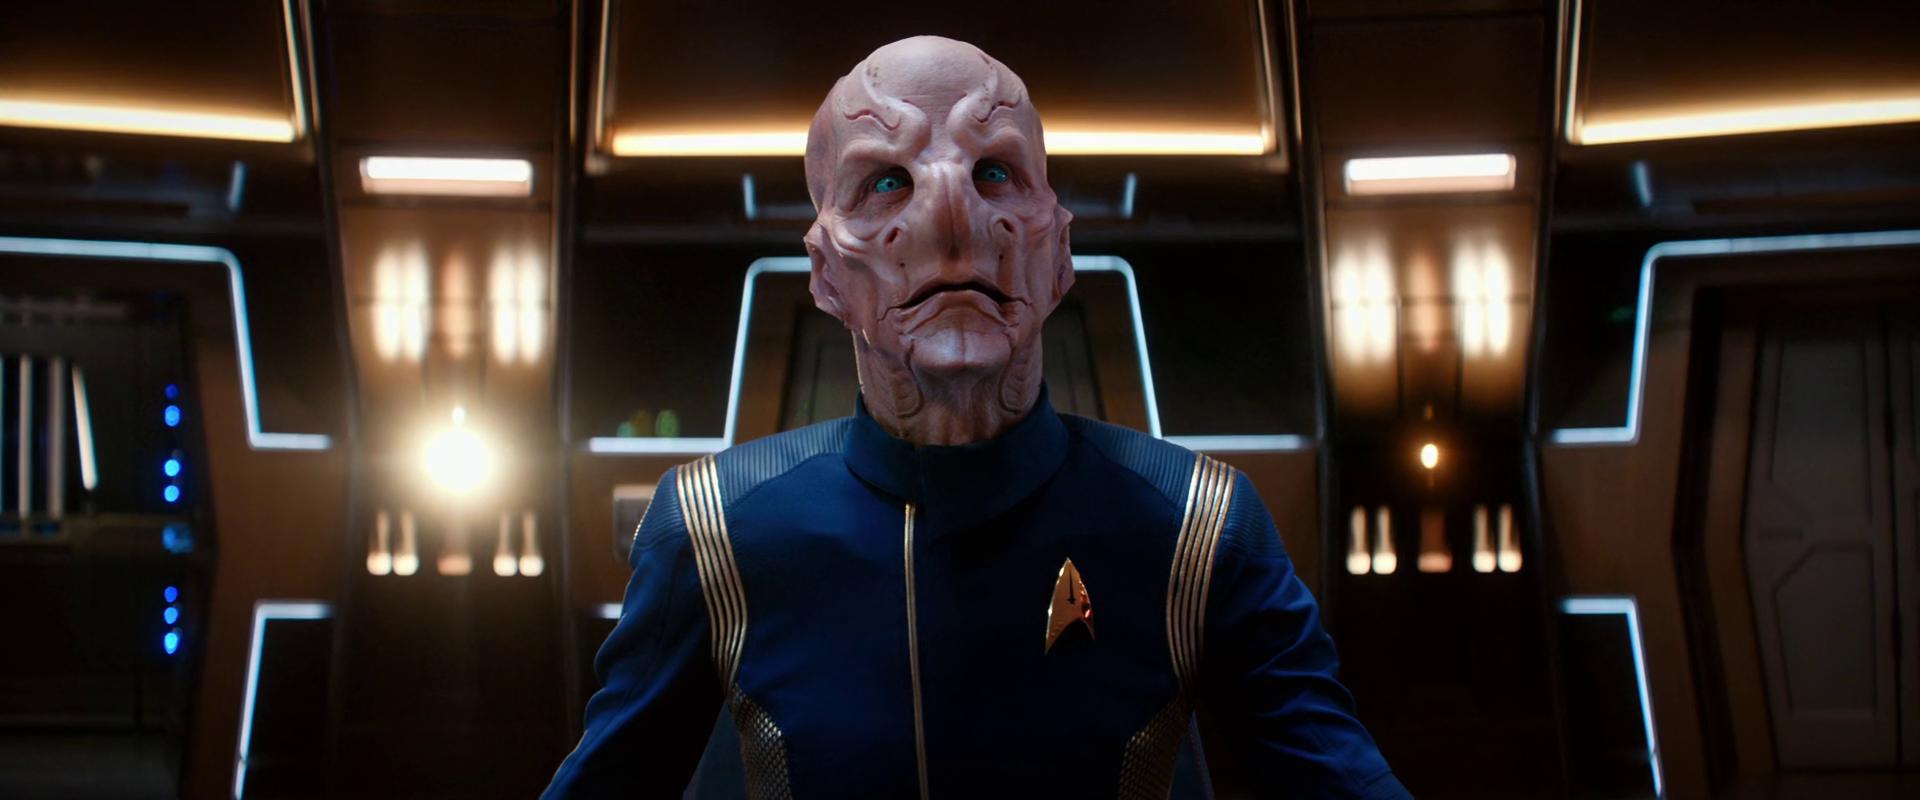 Star Trek Discovery - Stagione 2 (2019) (Completa) WEBRip 1080P HEVC ITA ENG DD5.1 x265 mkv Vlcsnap-2019-01-18-21jvkhy